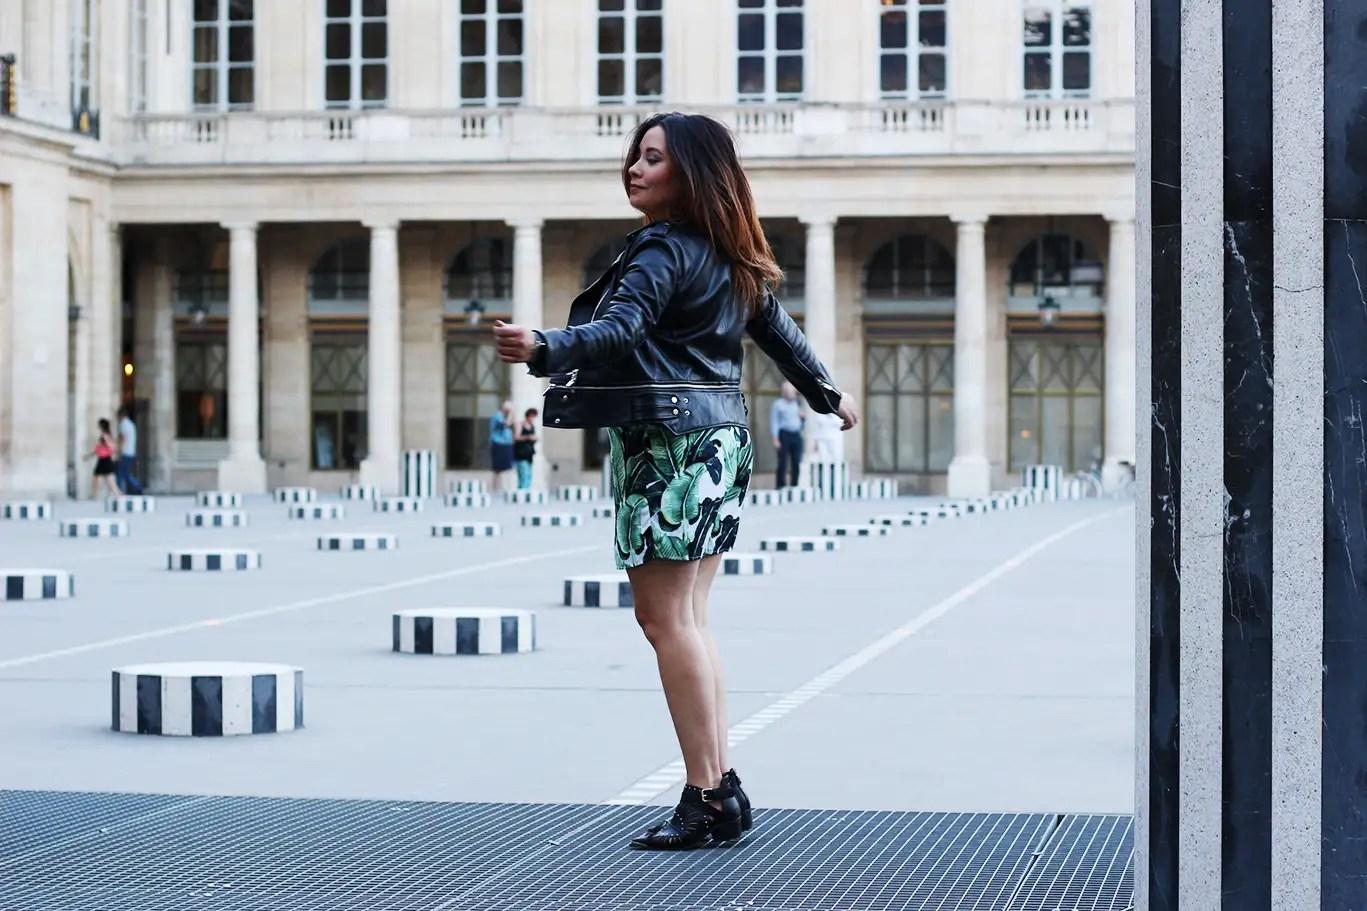 ootd, colonnes buren, blog mode, blogueuse mode, boohoo, asos, zara, veste simili cuir, combi short, boots boohoo